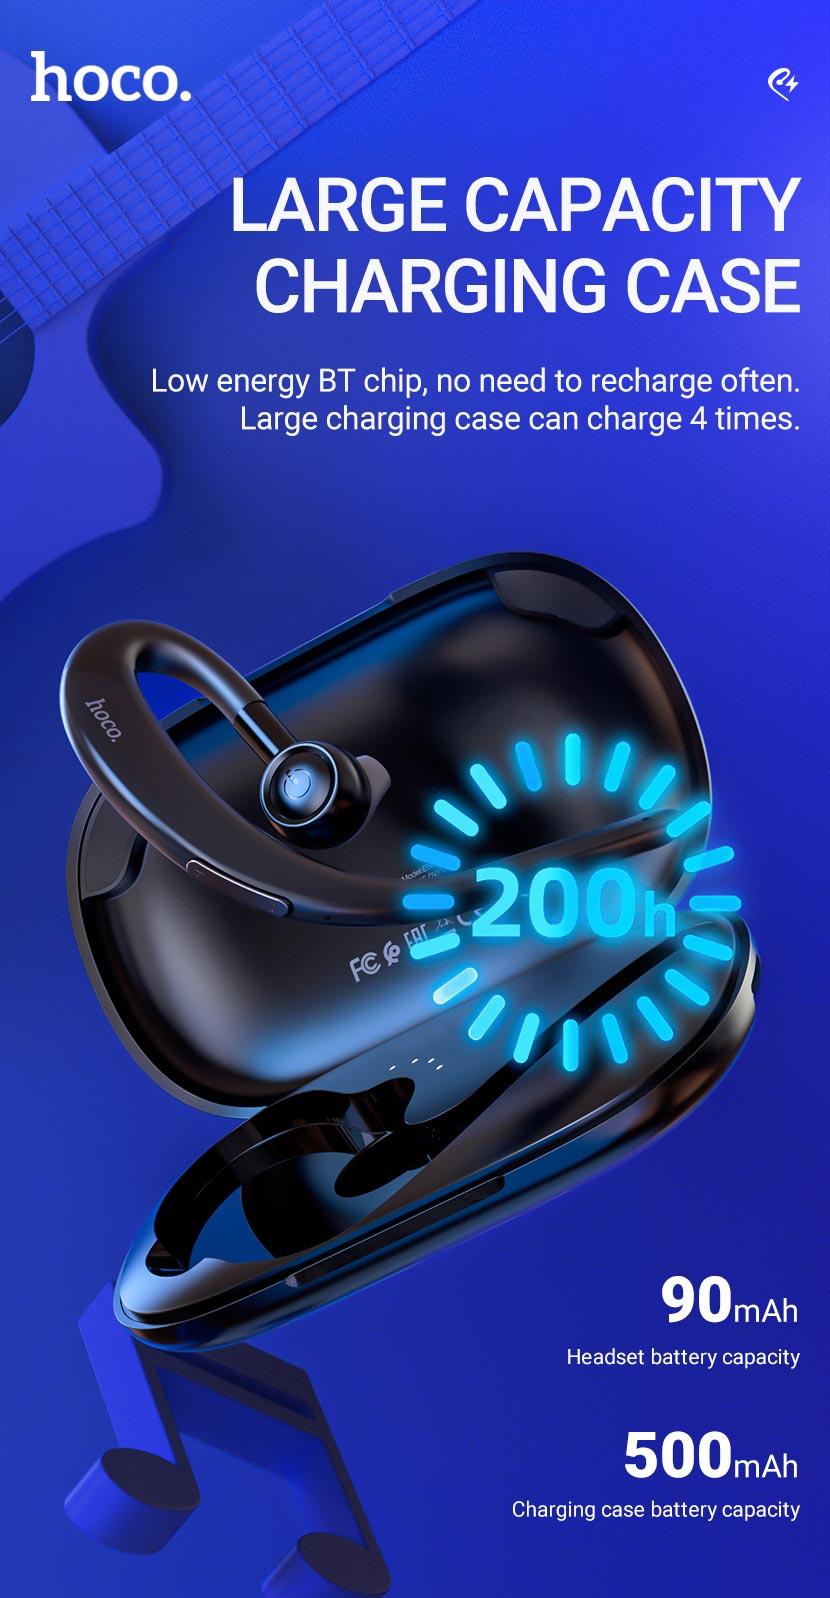 hoco news e56 shine business wireless headset case en